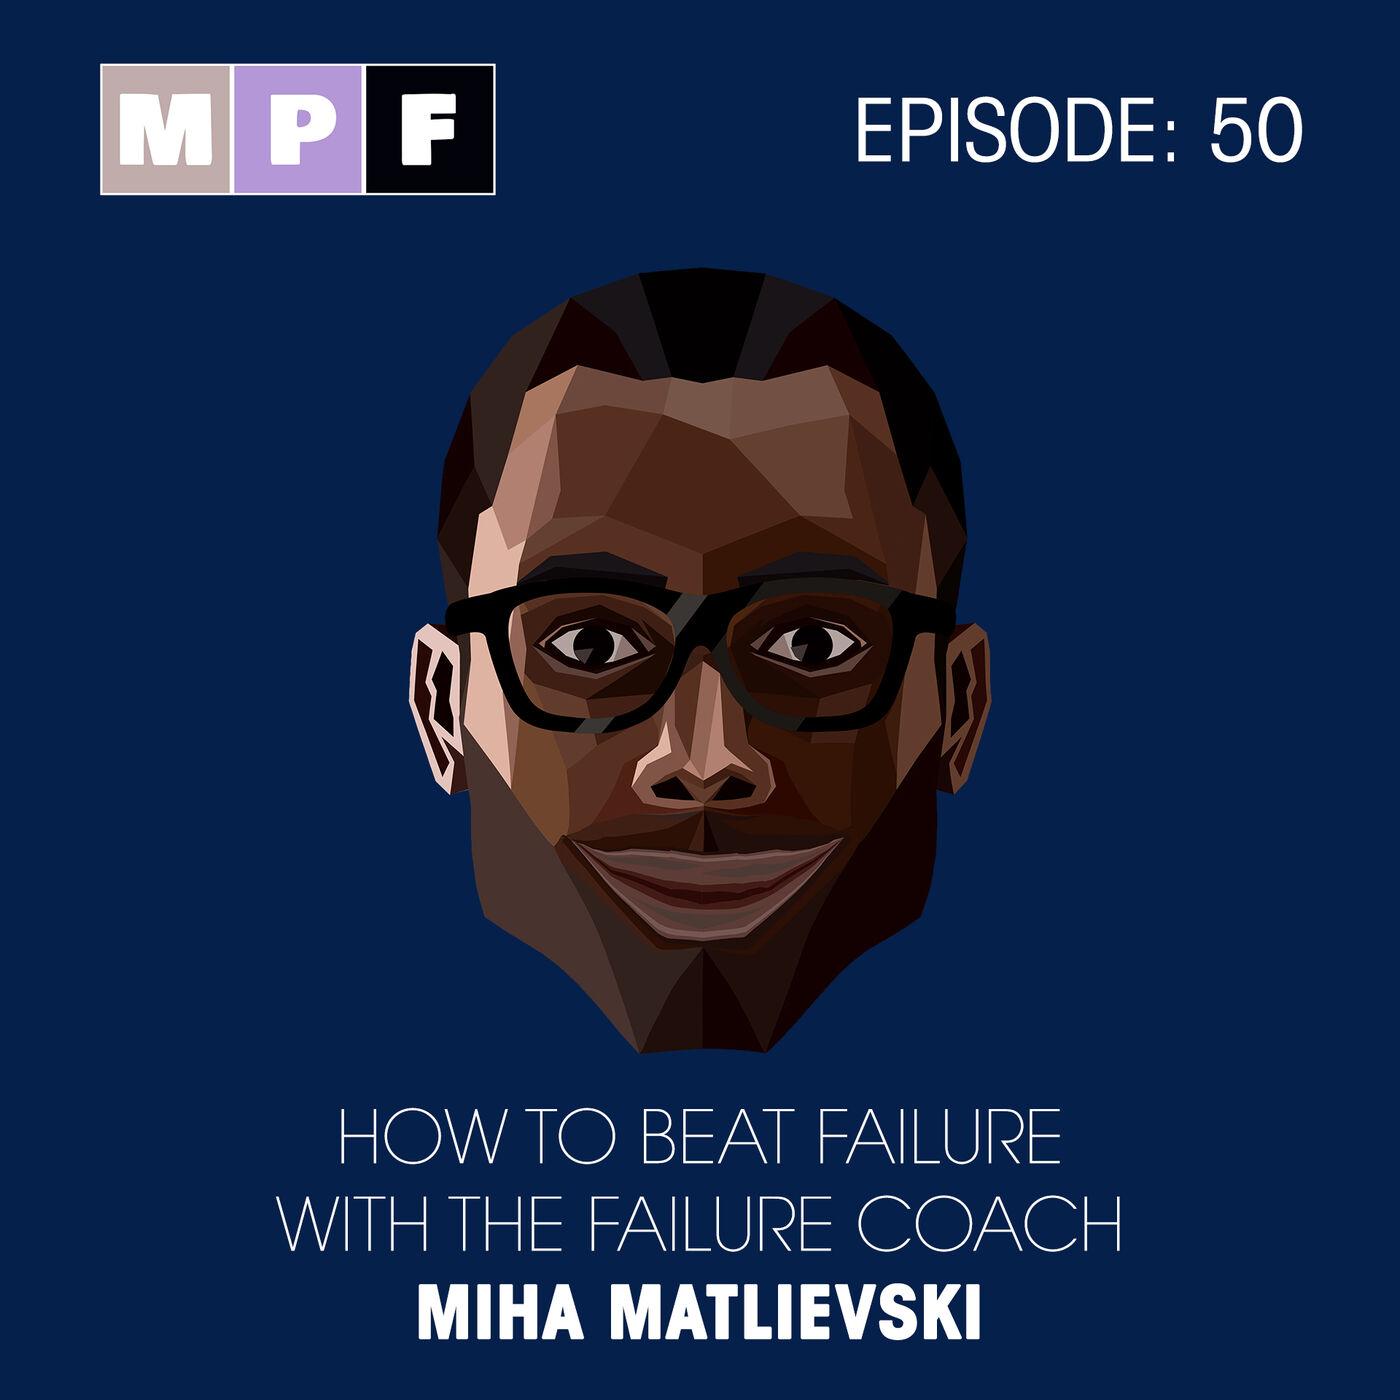 How to Beat Failure with the Failure Coach Miha Matlievski